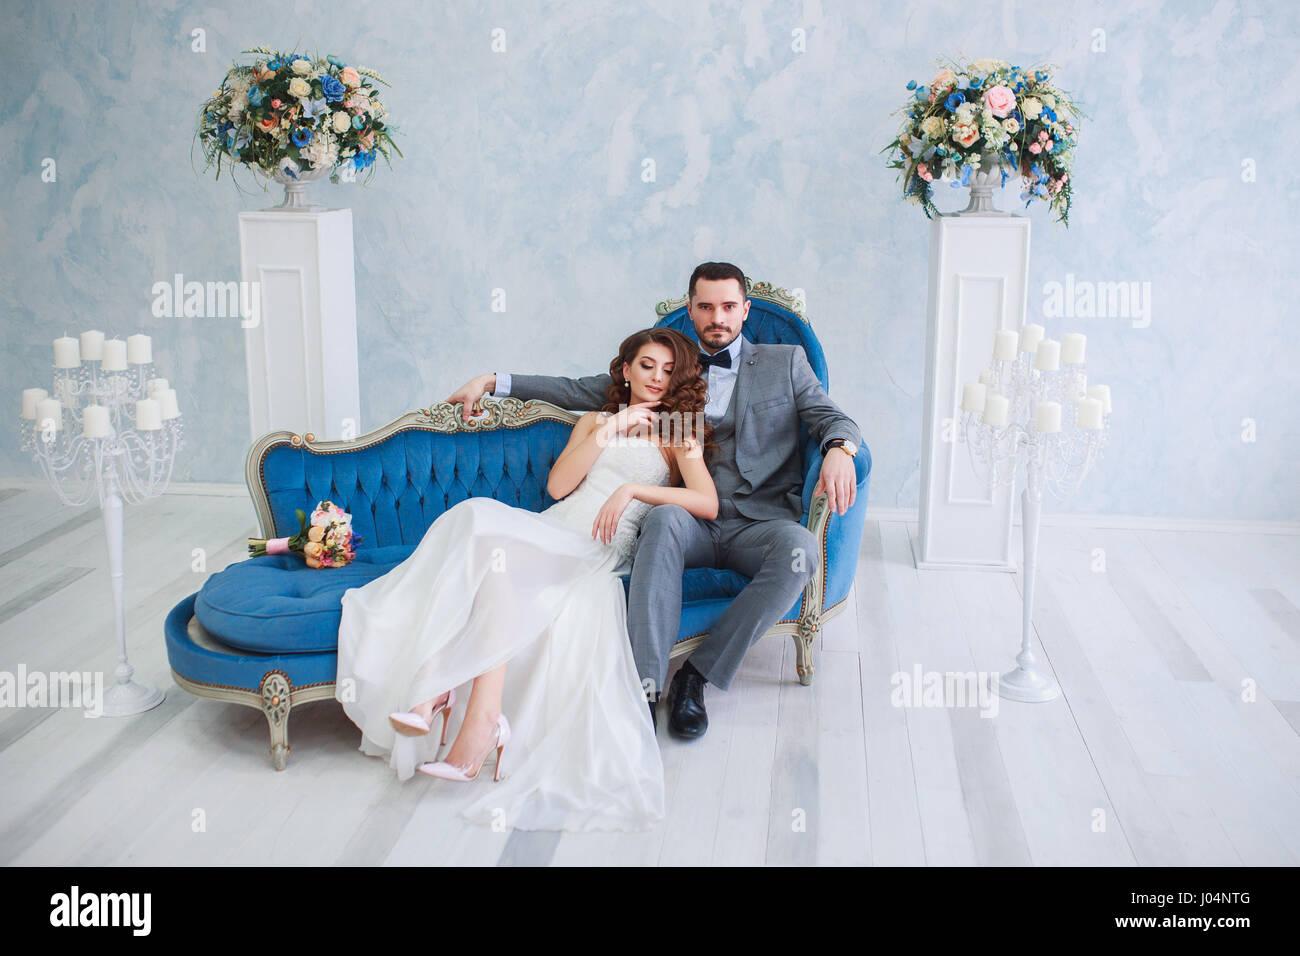 Groom Bride Sitting On Sofa Stock Photos & Groom Bride Sitting On ...